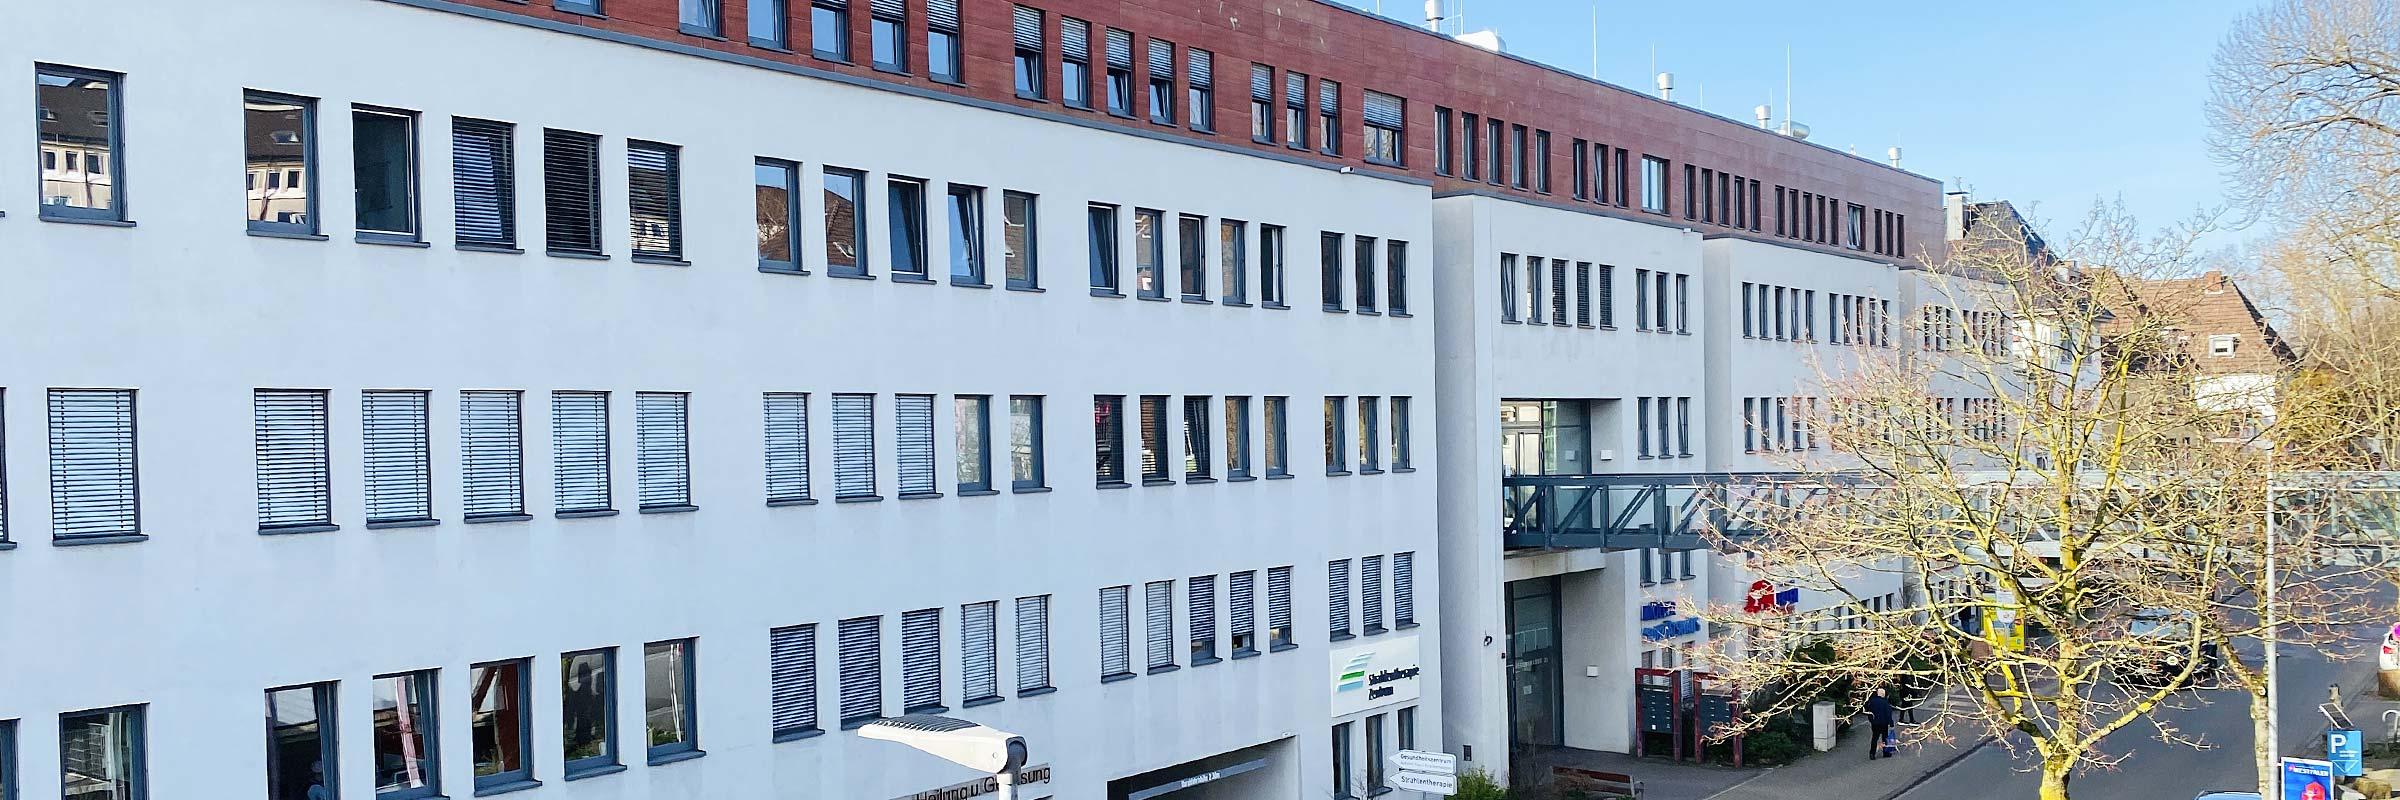 Notfallpraxis-Orthopaedie-Bochum